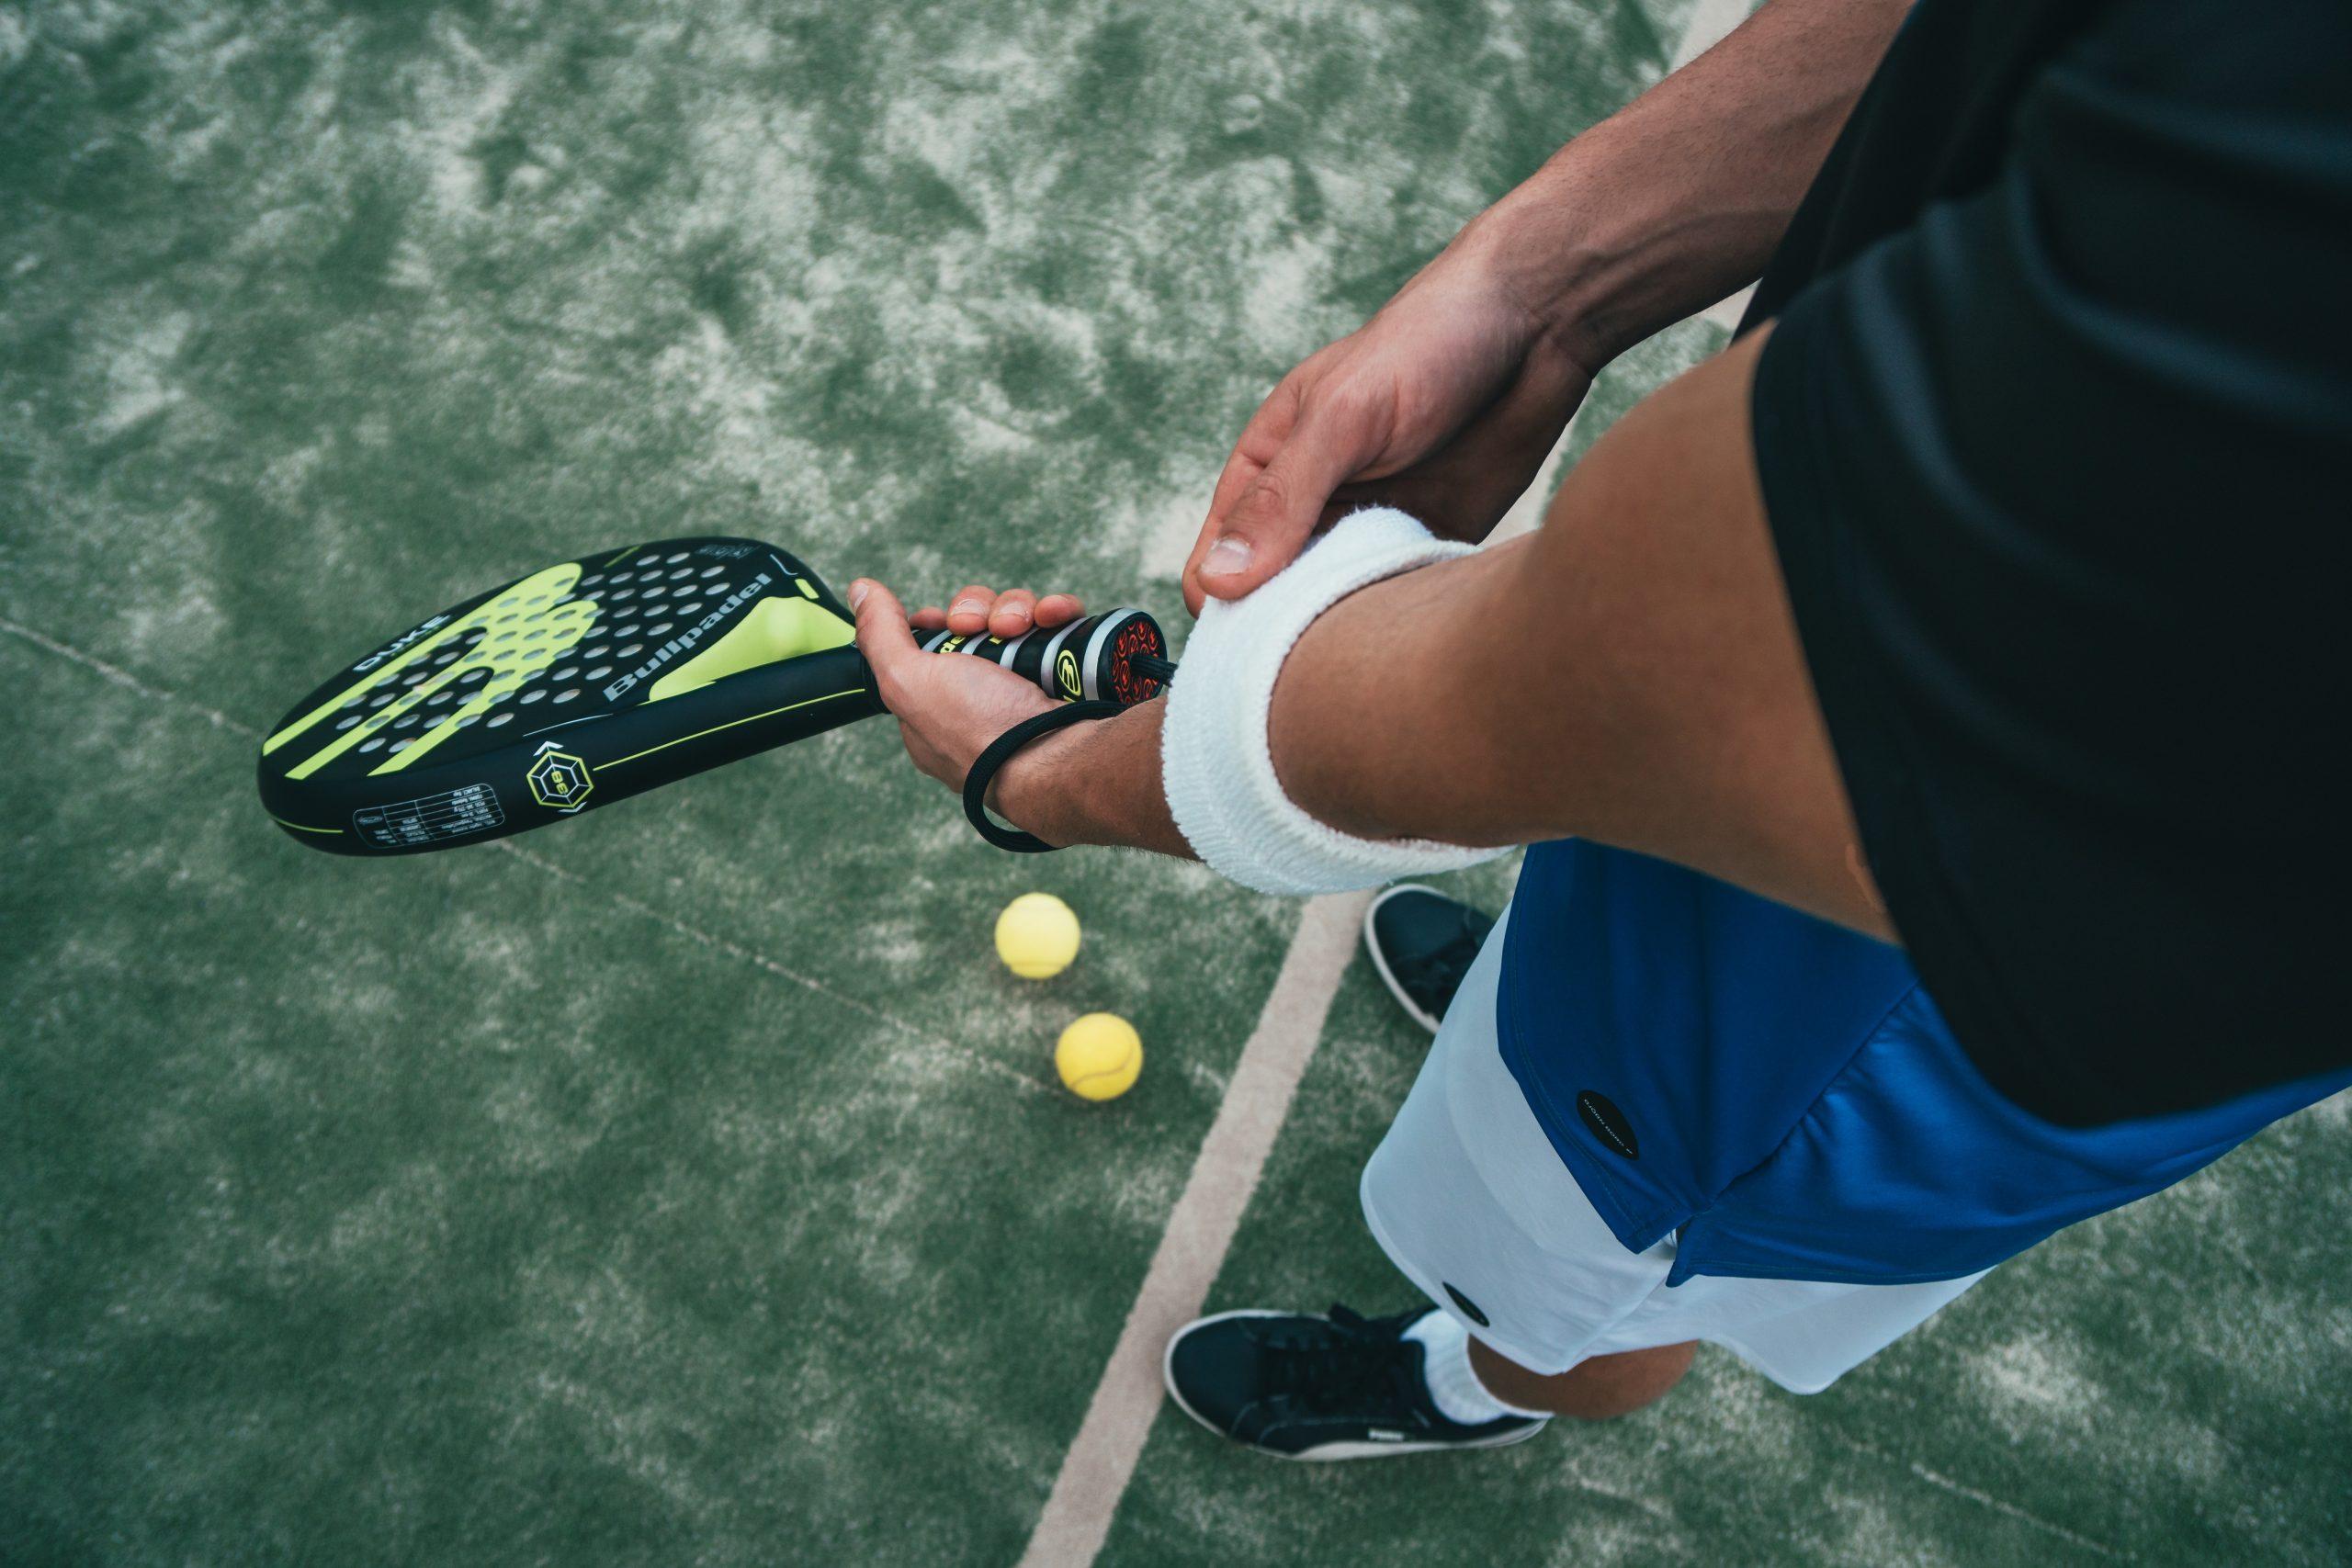 Tennis Club Equipment Essex